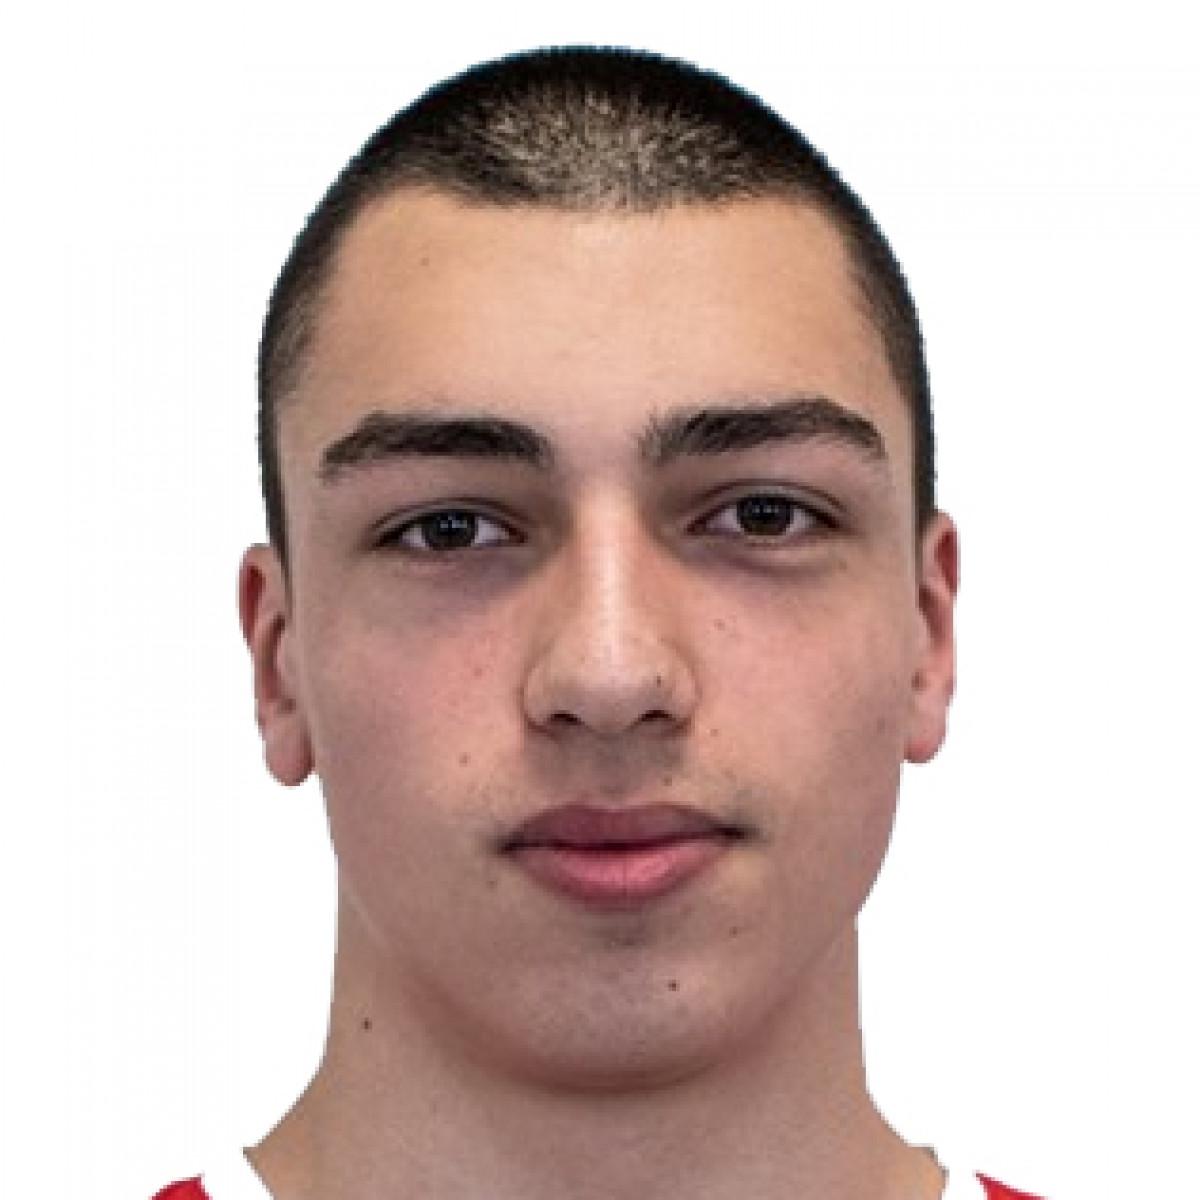 Luka Khutsishvili